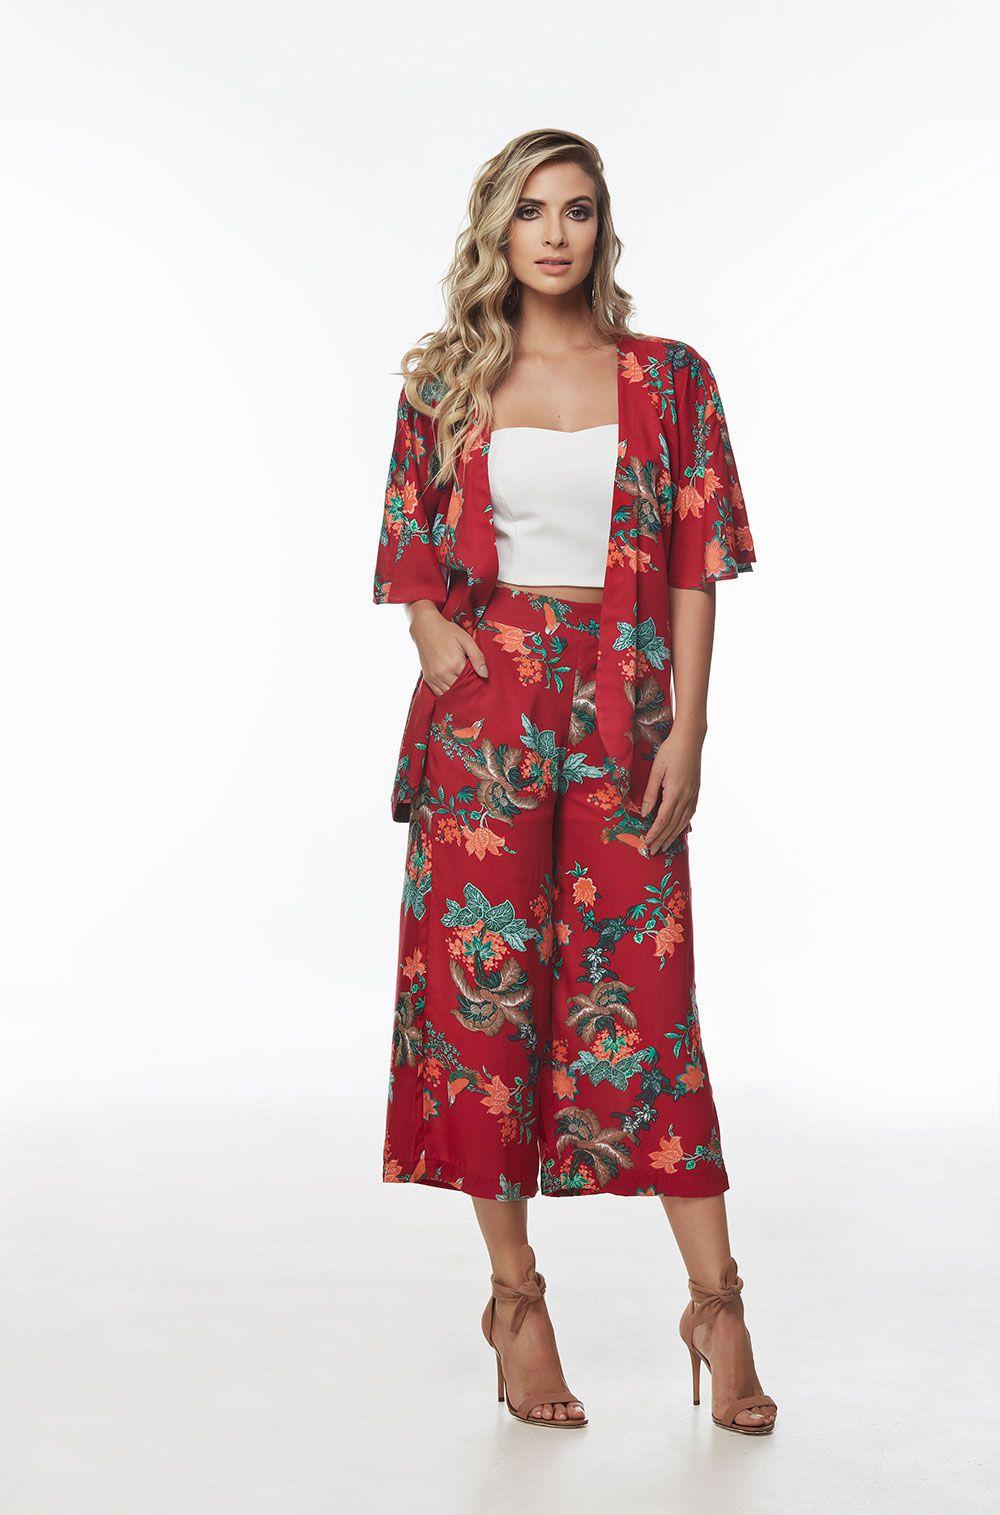 a1aa4bfa6 Conjunto calça pantacourt e kimono estampada - VANKOKE - Moda ...